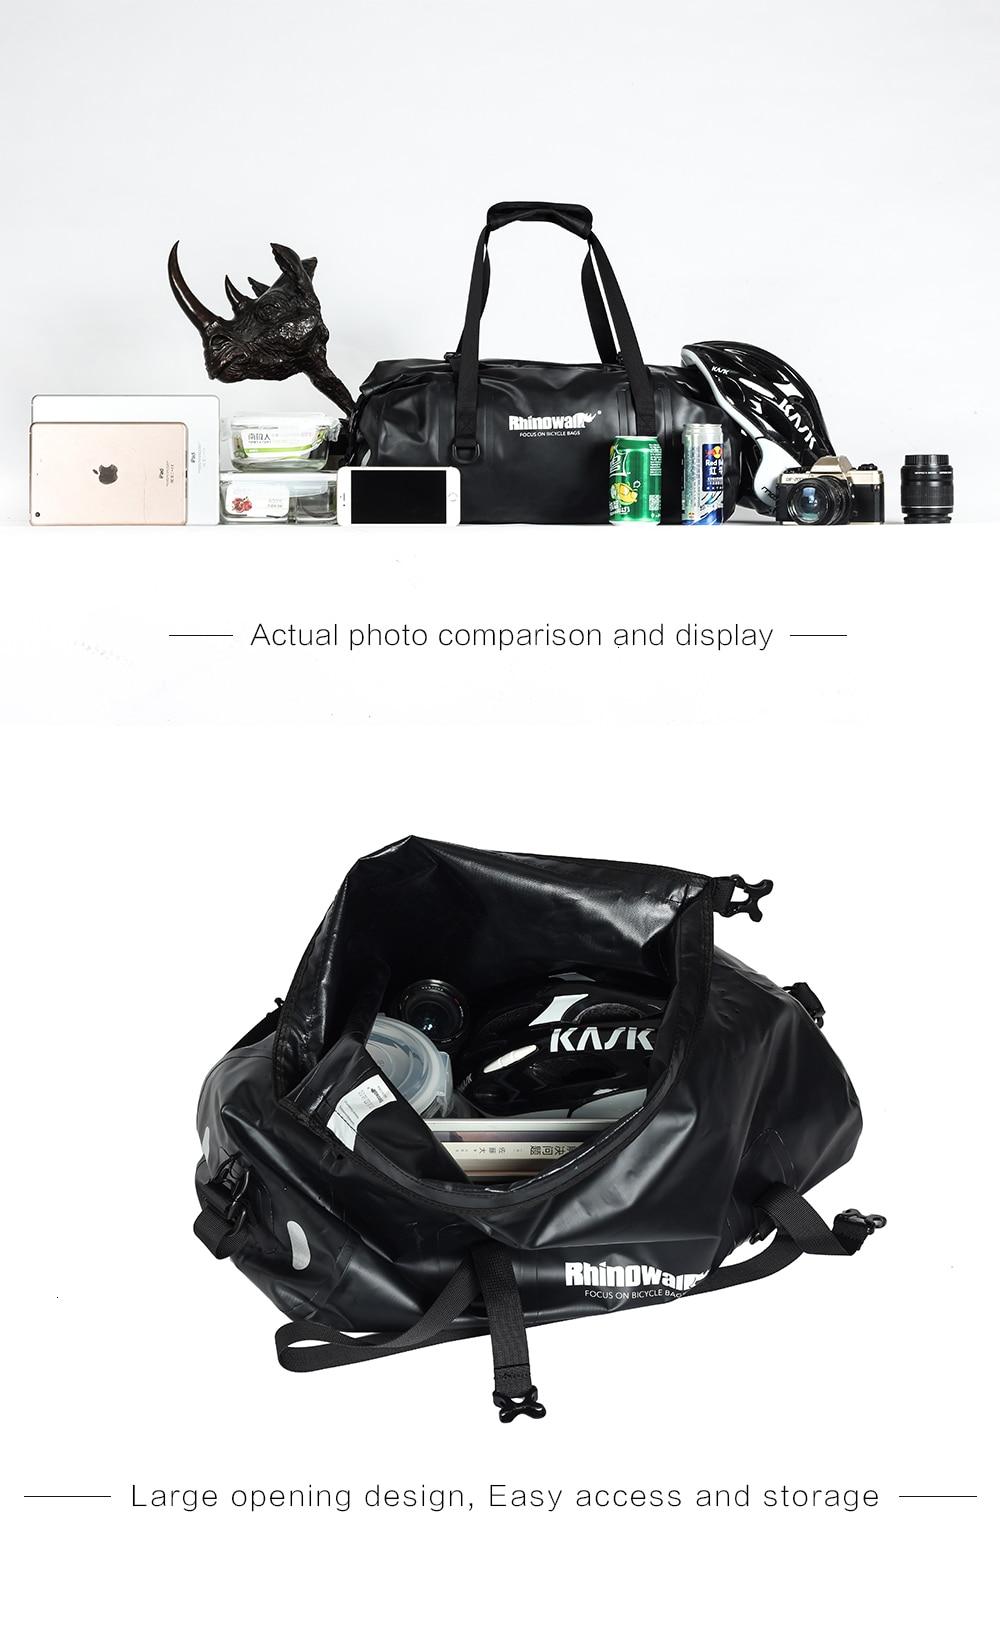 Rhinowalk Bicycle Luggage Bags 20L Full Waterproof for Road Bike Rear Rack Trunk Cycling Saddle Storage Pannier Multi Travel Bag (6)